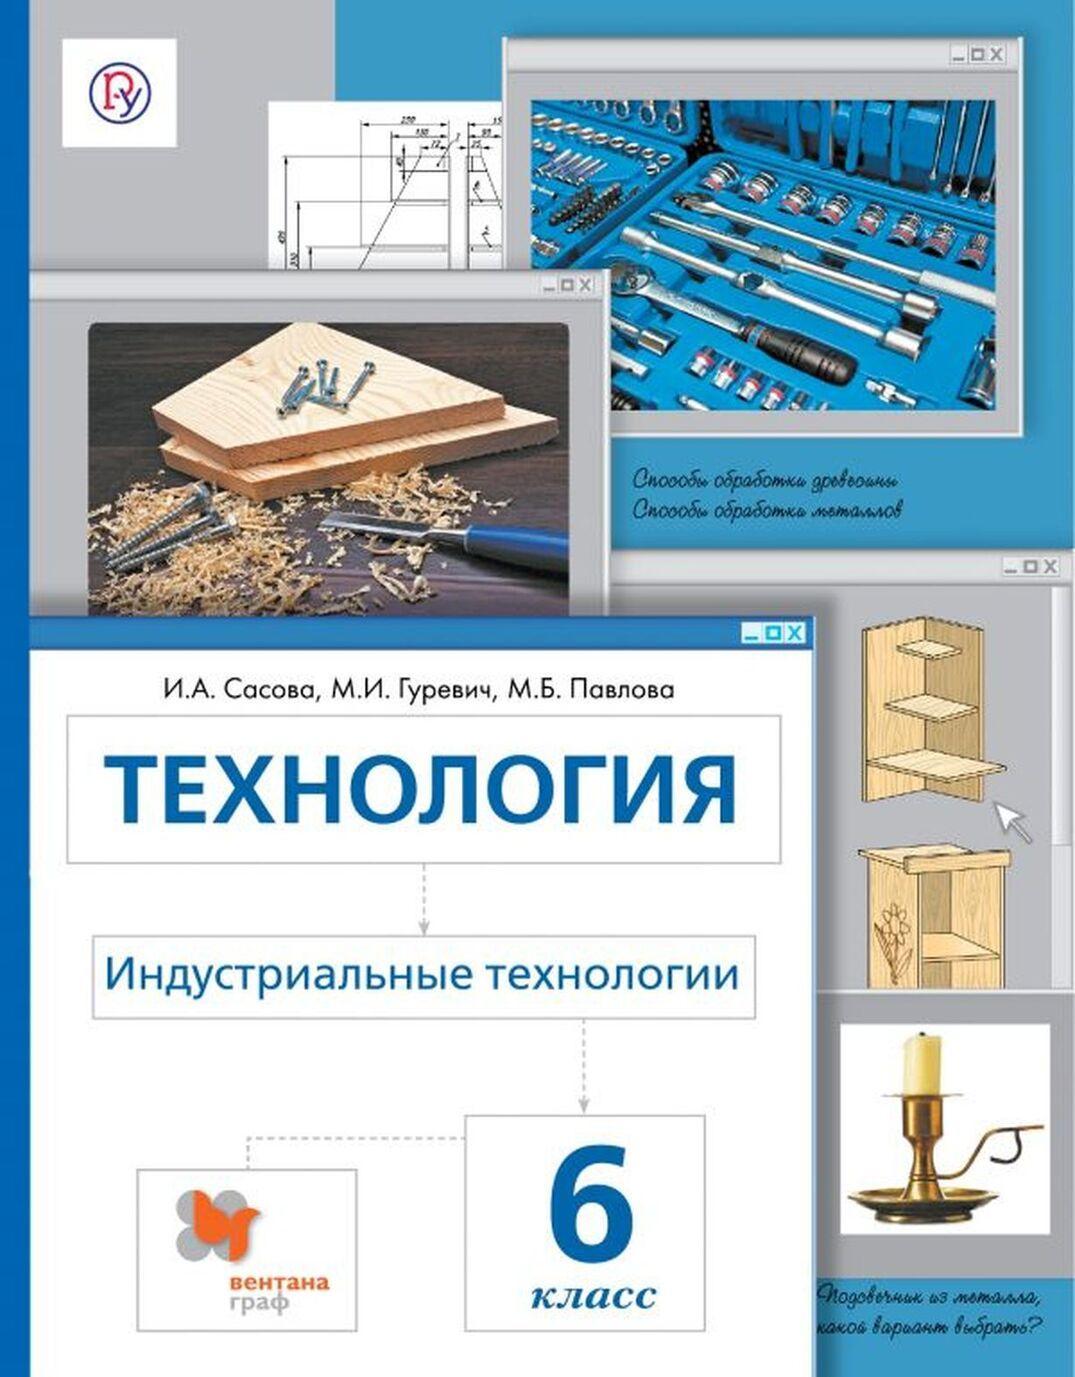 Tekhnologija. Industrialnye tekhnologii. 6klass. Uchebnik | Sasova Irina Abramovna, Pavlova Margarita Borisovna